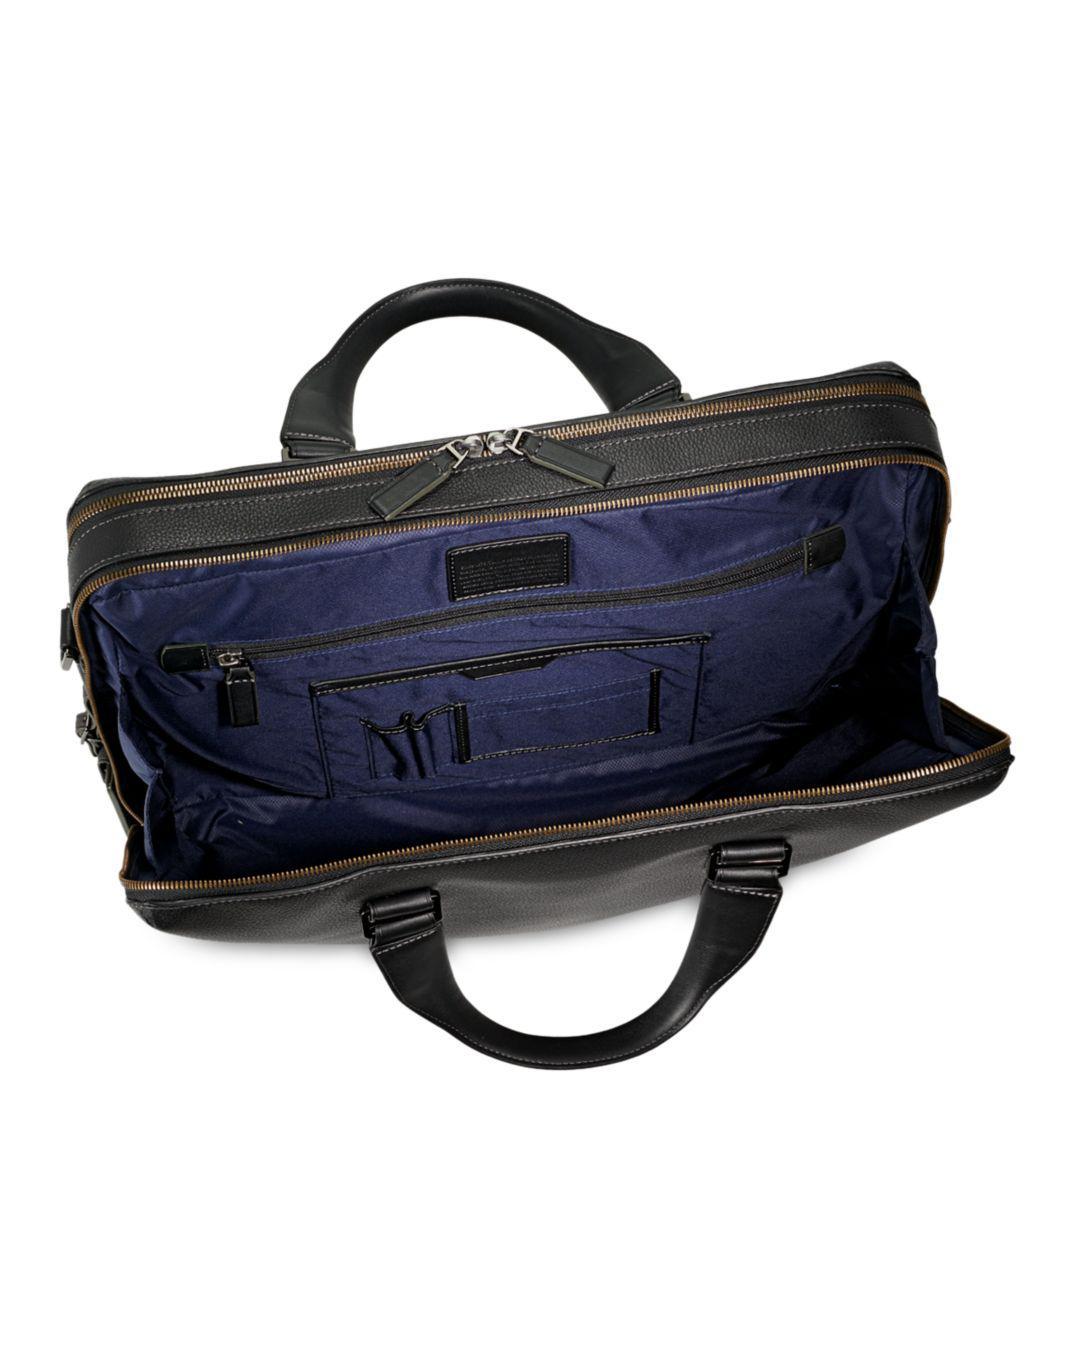 9d5370c3b560 Lyst - Tumi Harrison Leather Horton Double Zip Briefcase in Black for Men